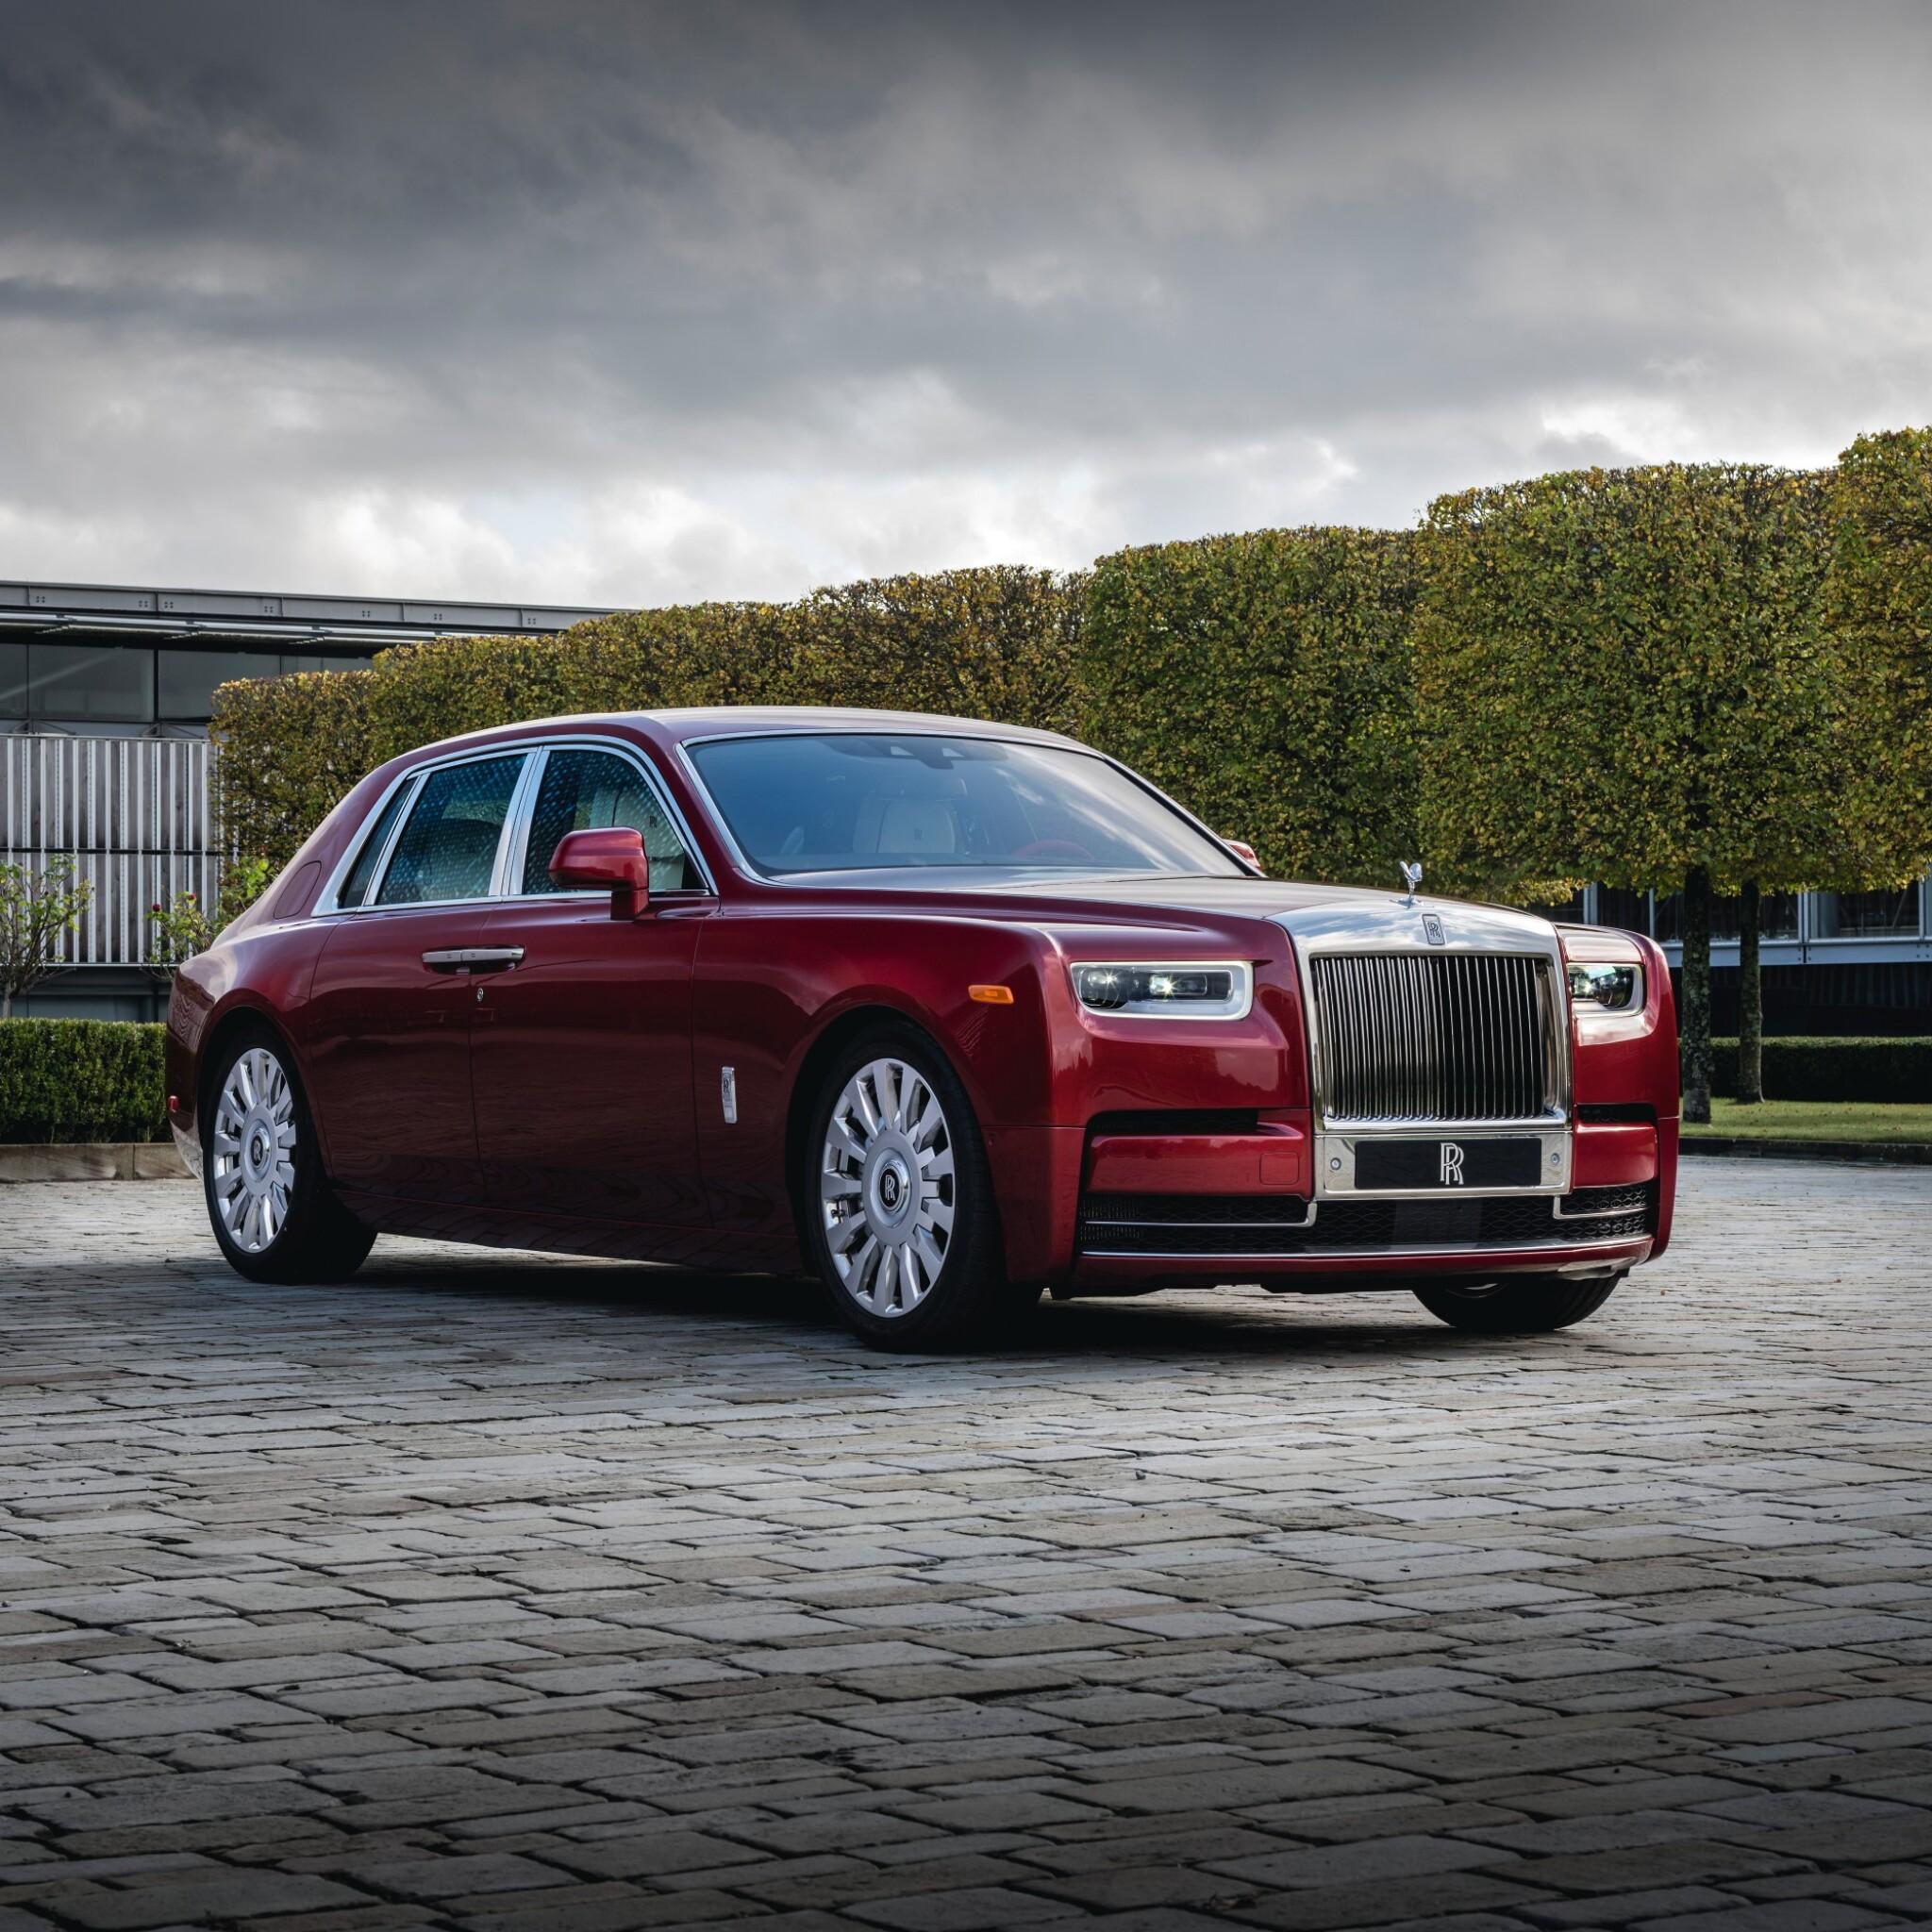 Red Rolls-Royce Phantom Commission with Mickalene Thomas